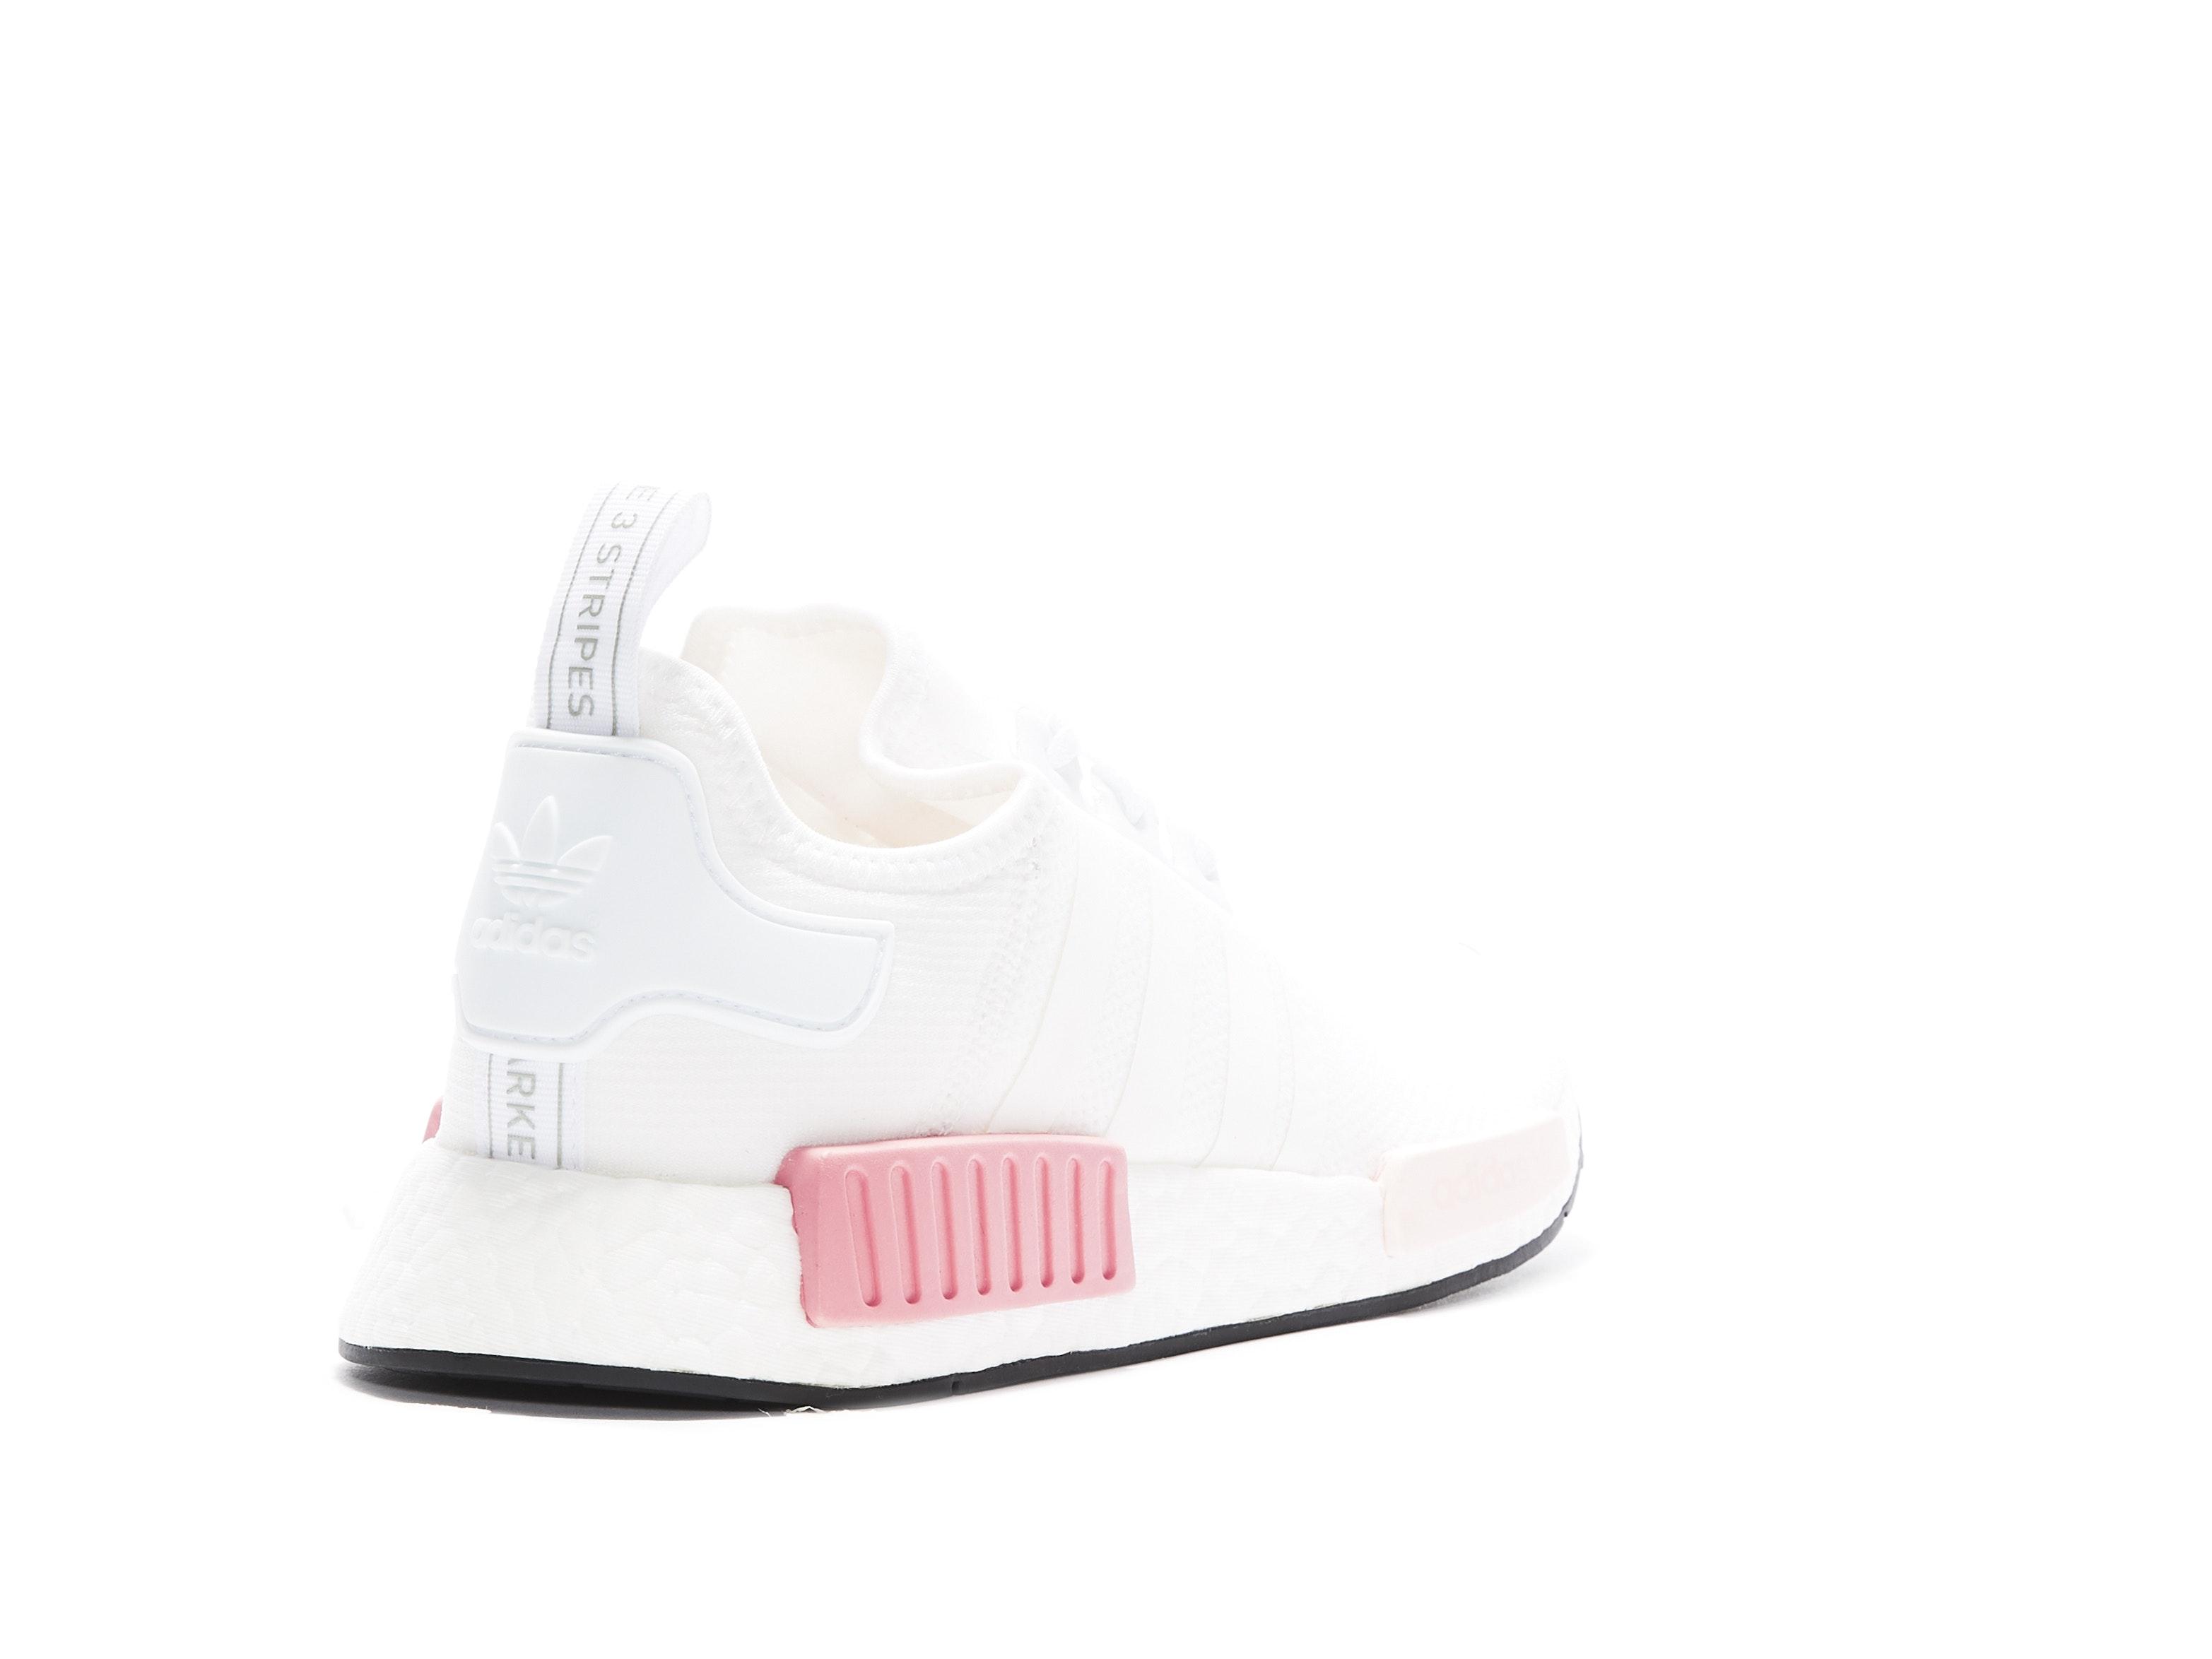 32339e638 Shop White Rose NMD R1 (W) Online